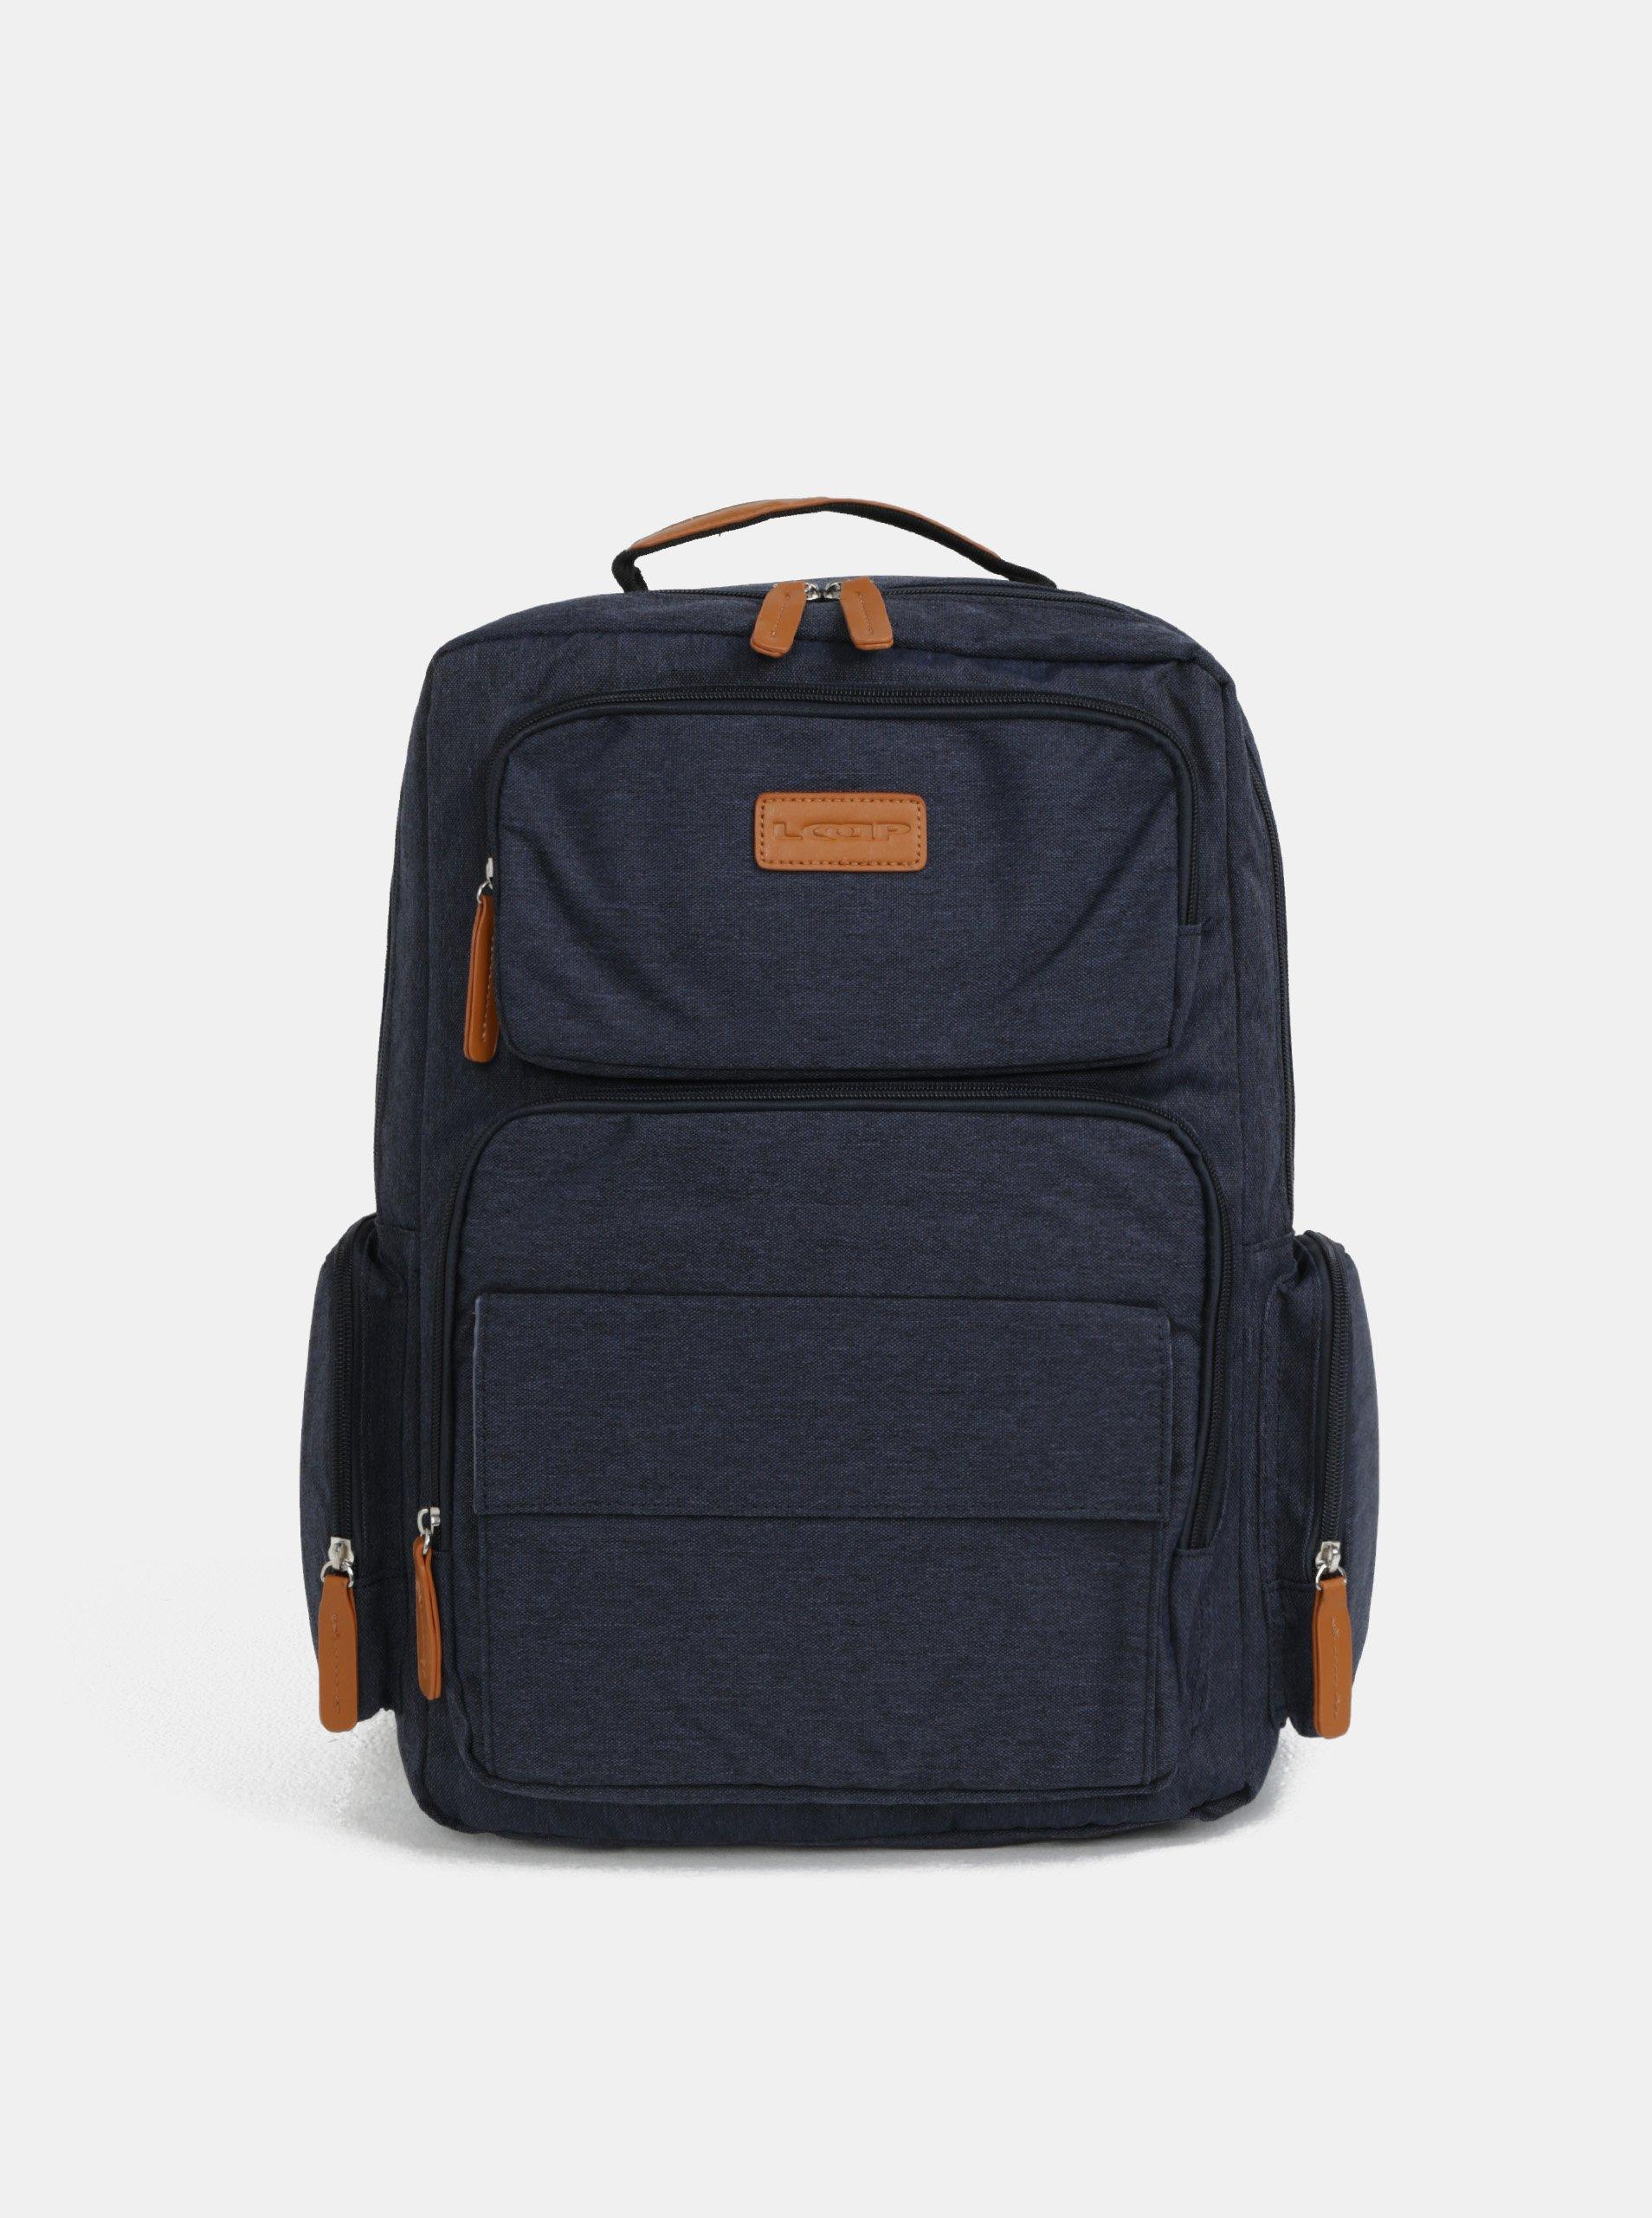 822f51acaff Modrý batoh na notebook LOAP Eos